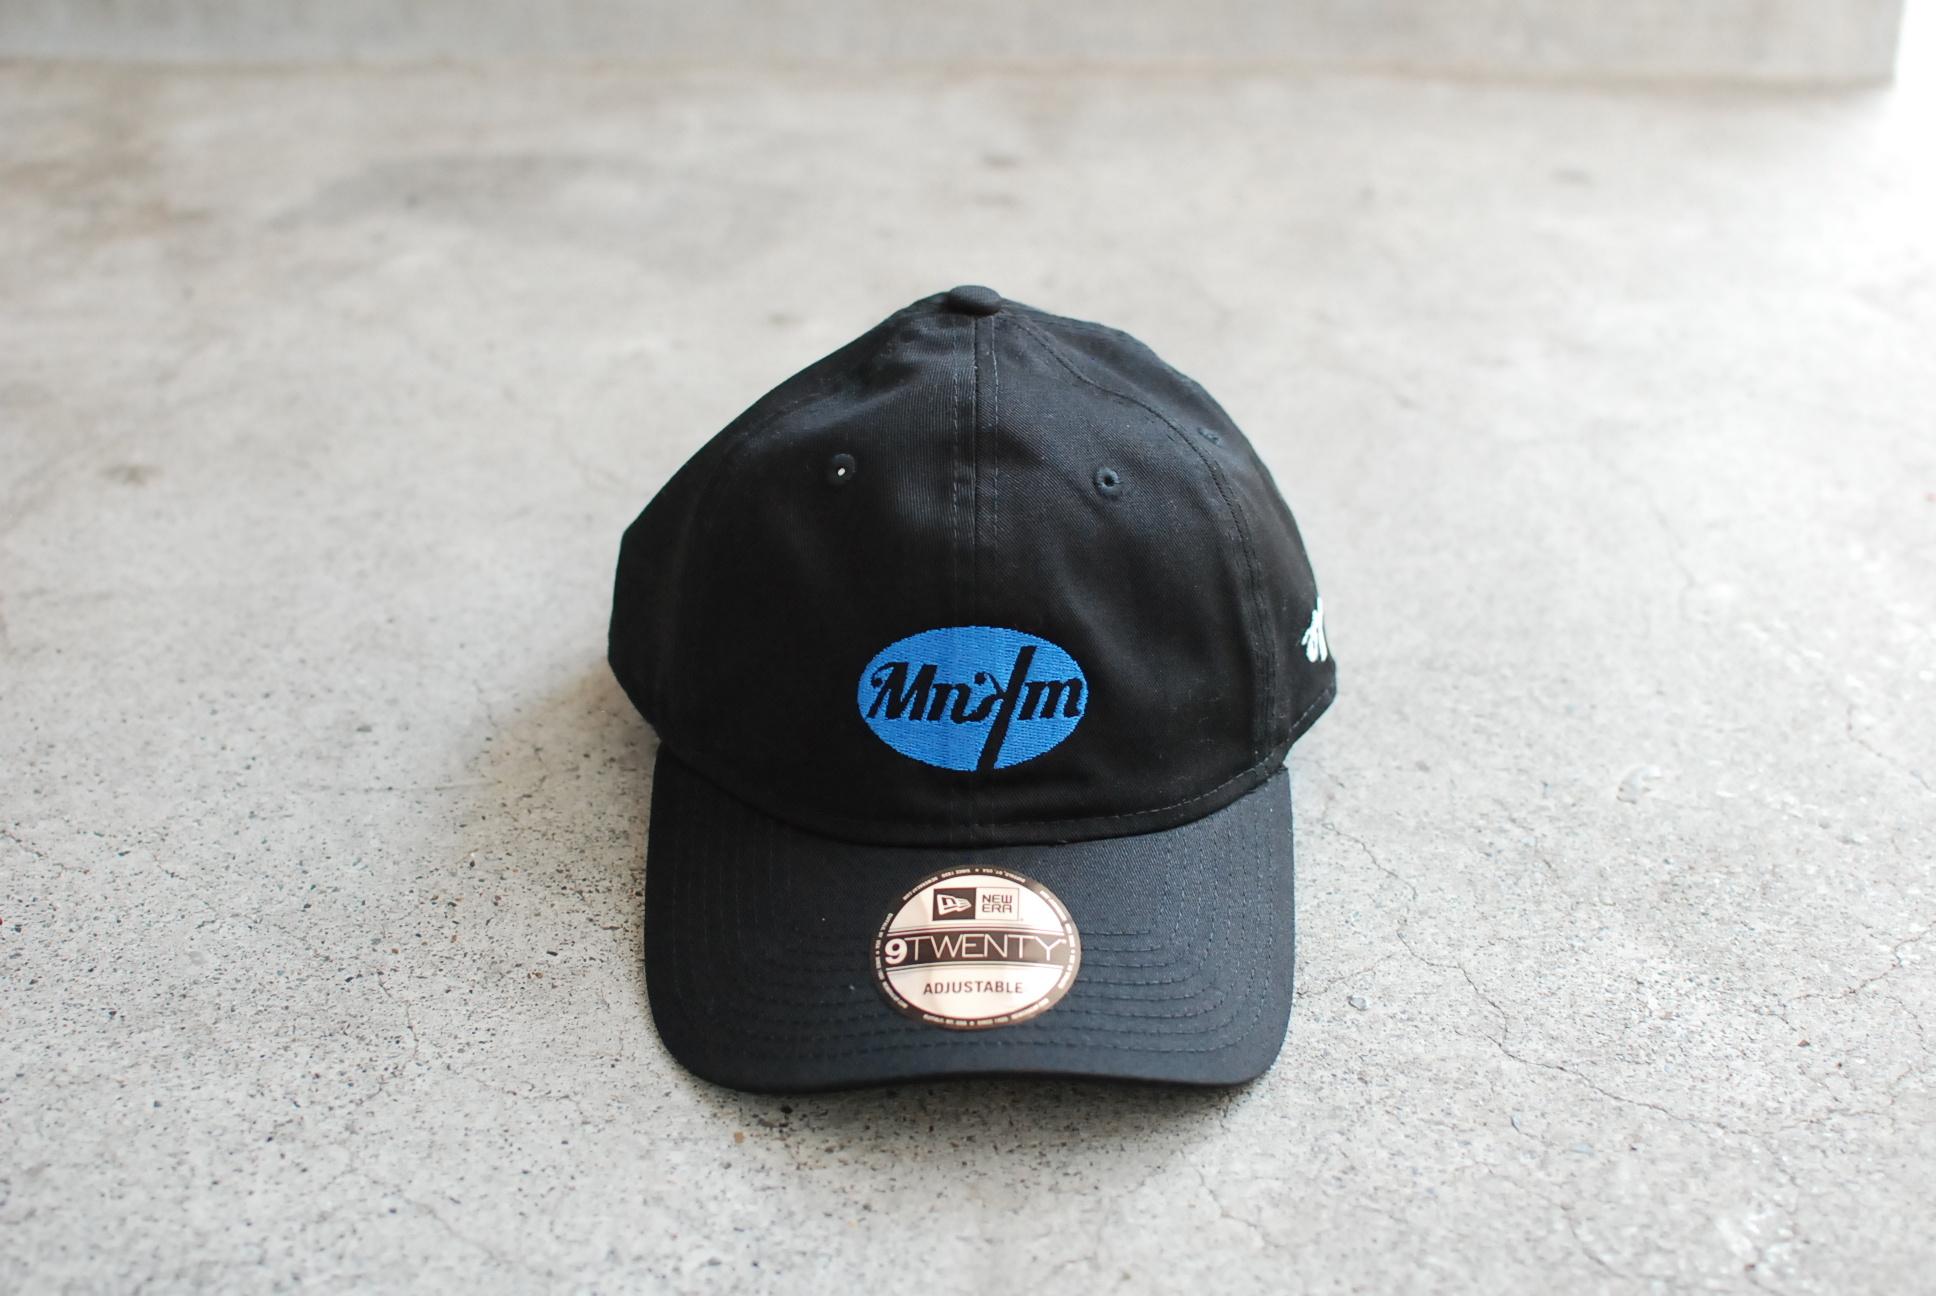 【UNISEX】LSF '87 MNKM CAP